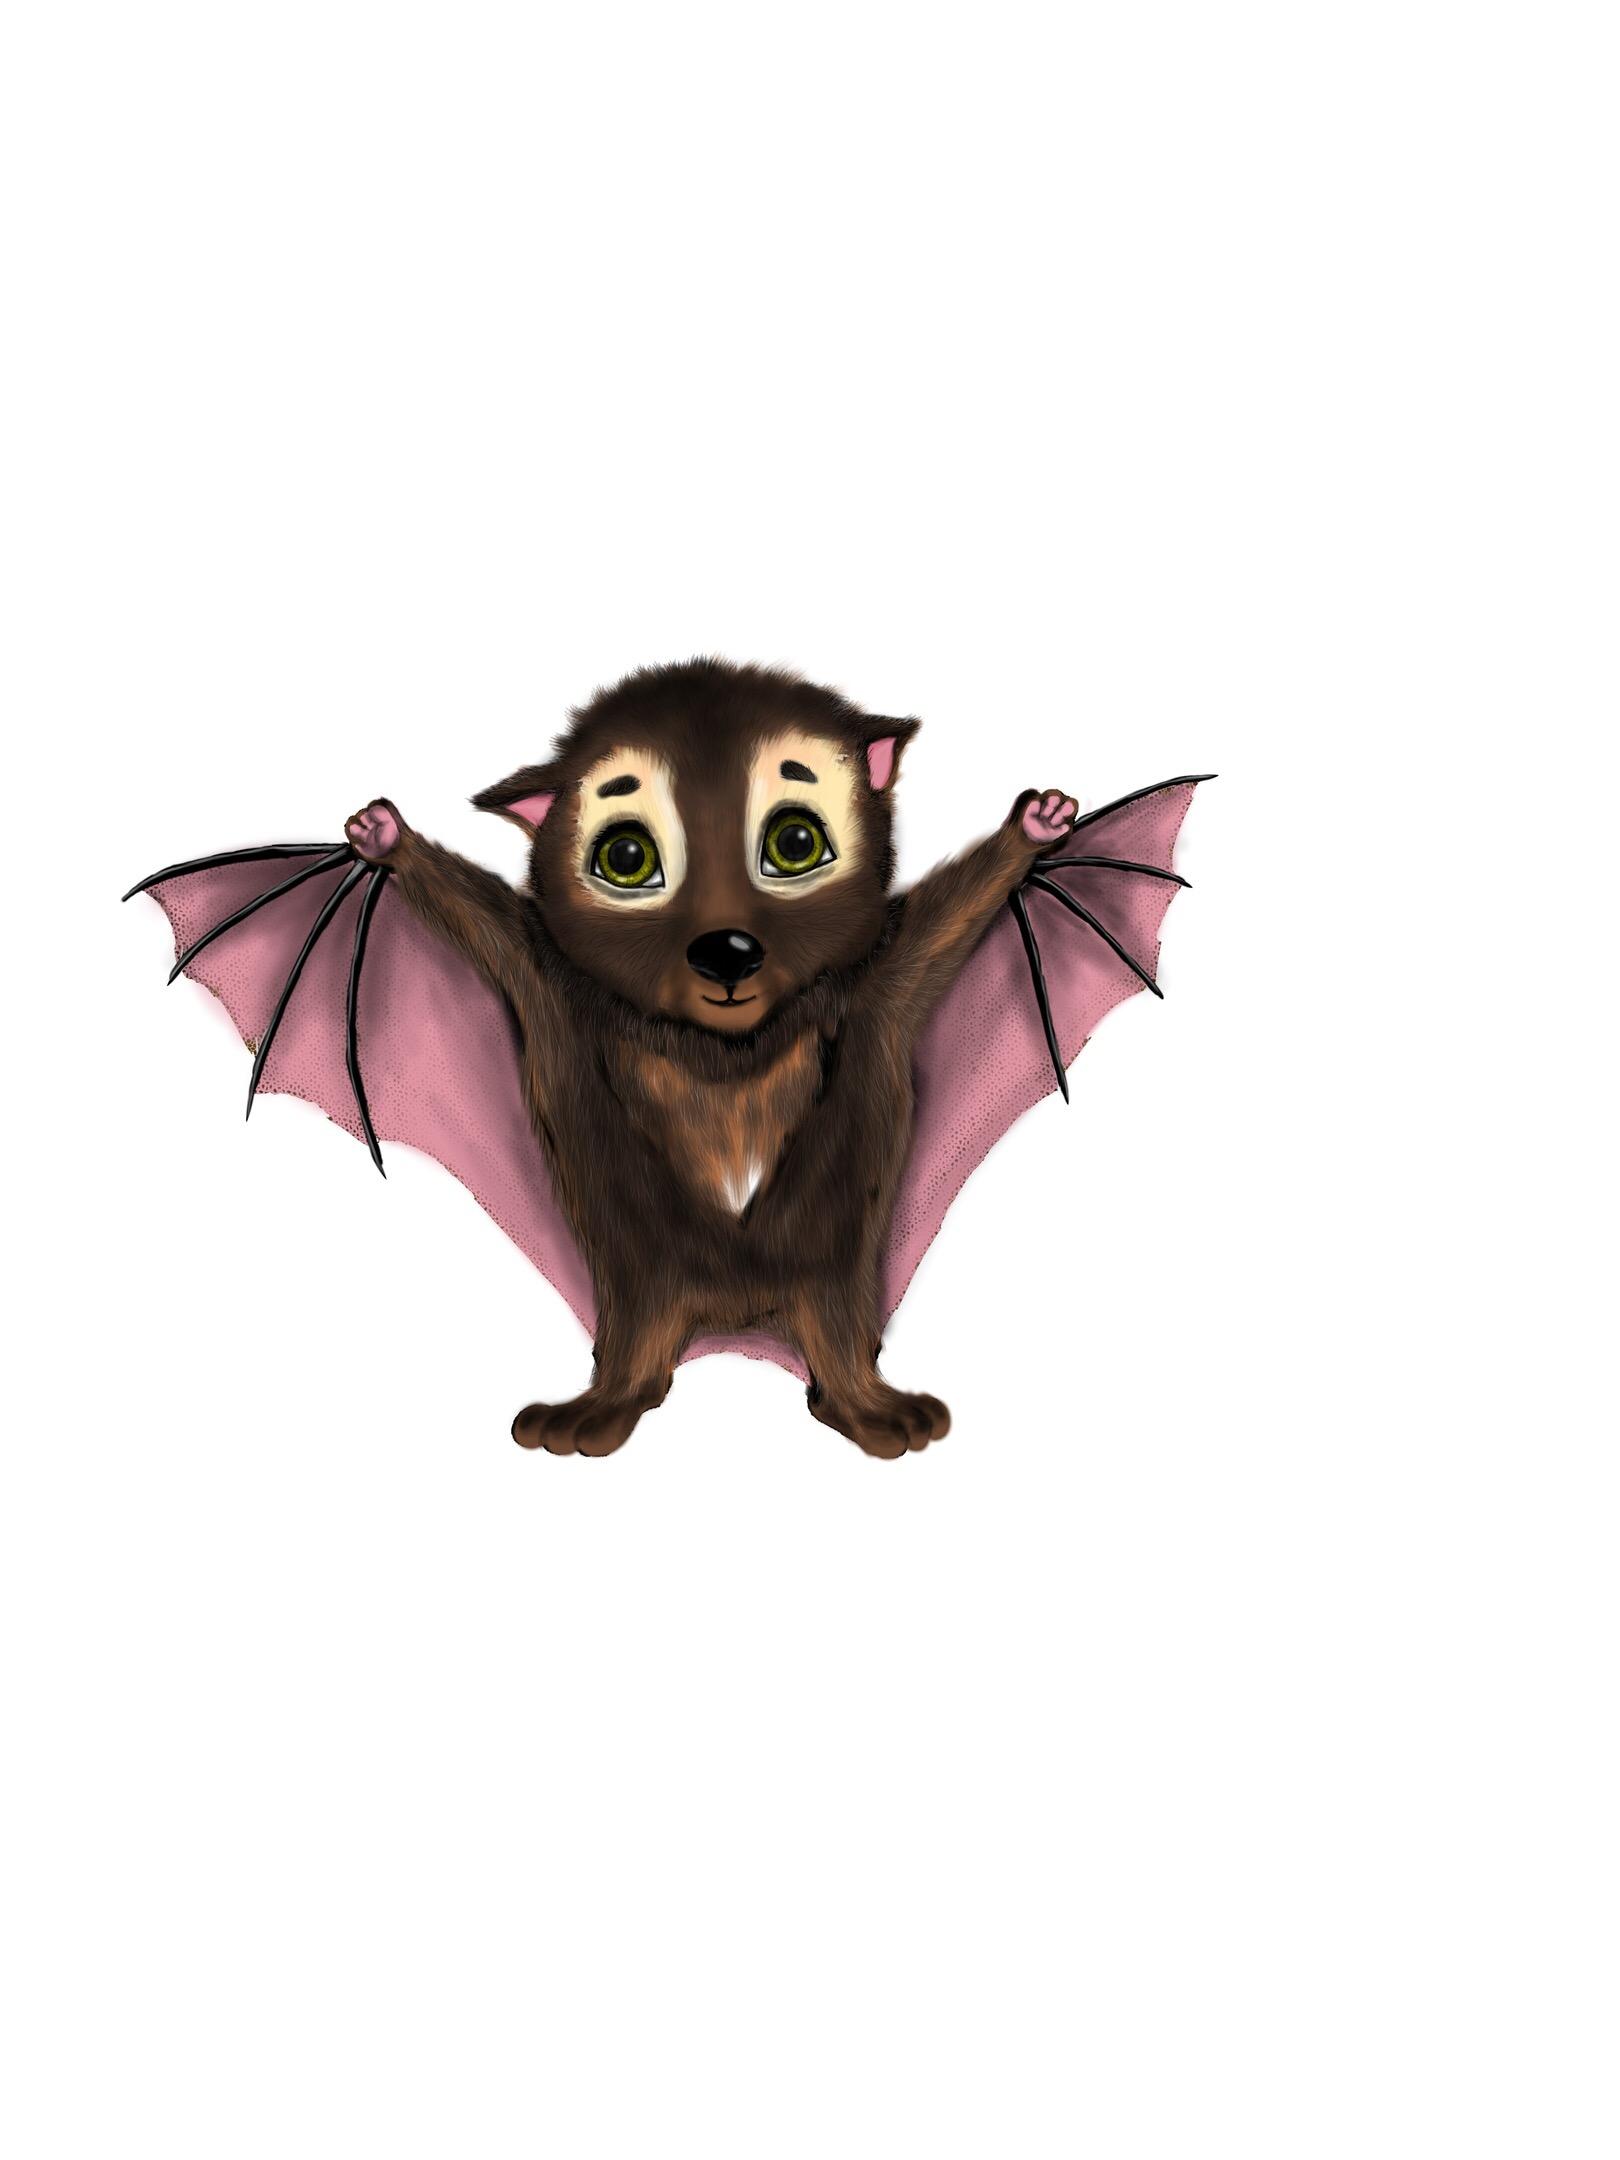 Нарисовать персонажа для анимации фото f_0045c9333f30dd73.jpg